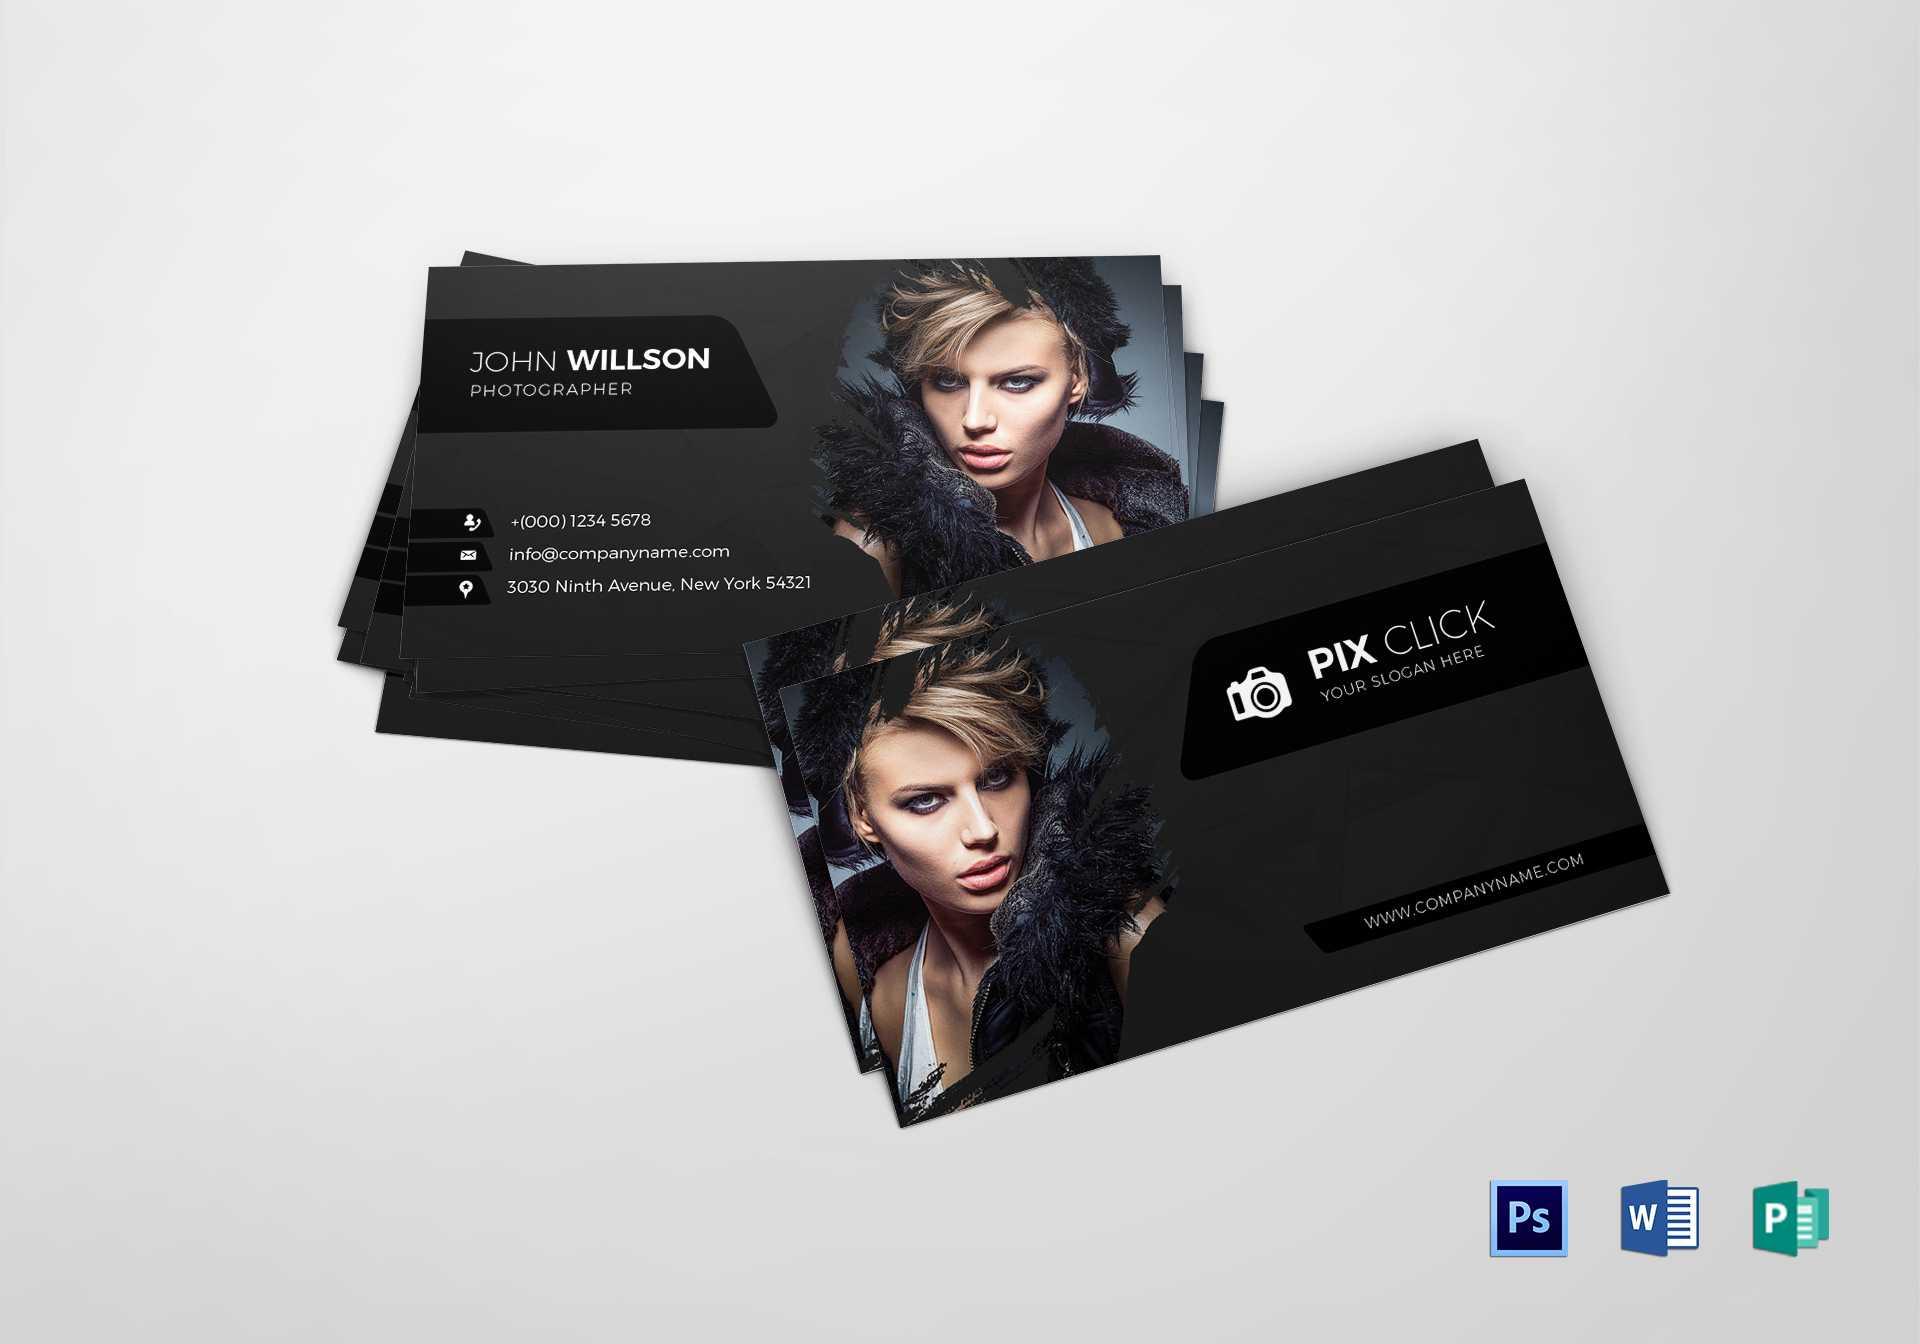 010 Template Ideas Photographer Business Card Psd Free with Photography Business Card Template Photoshop